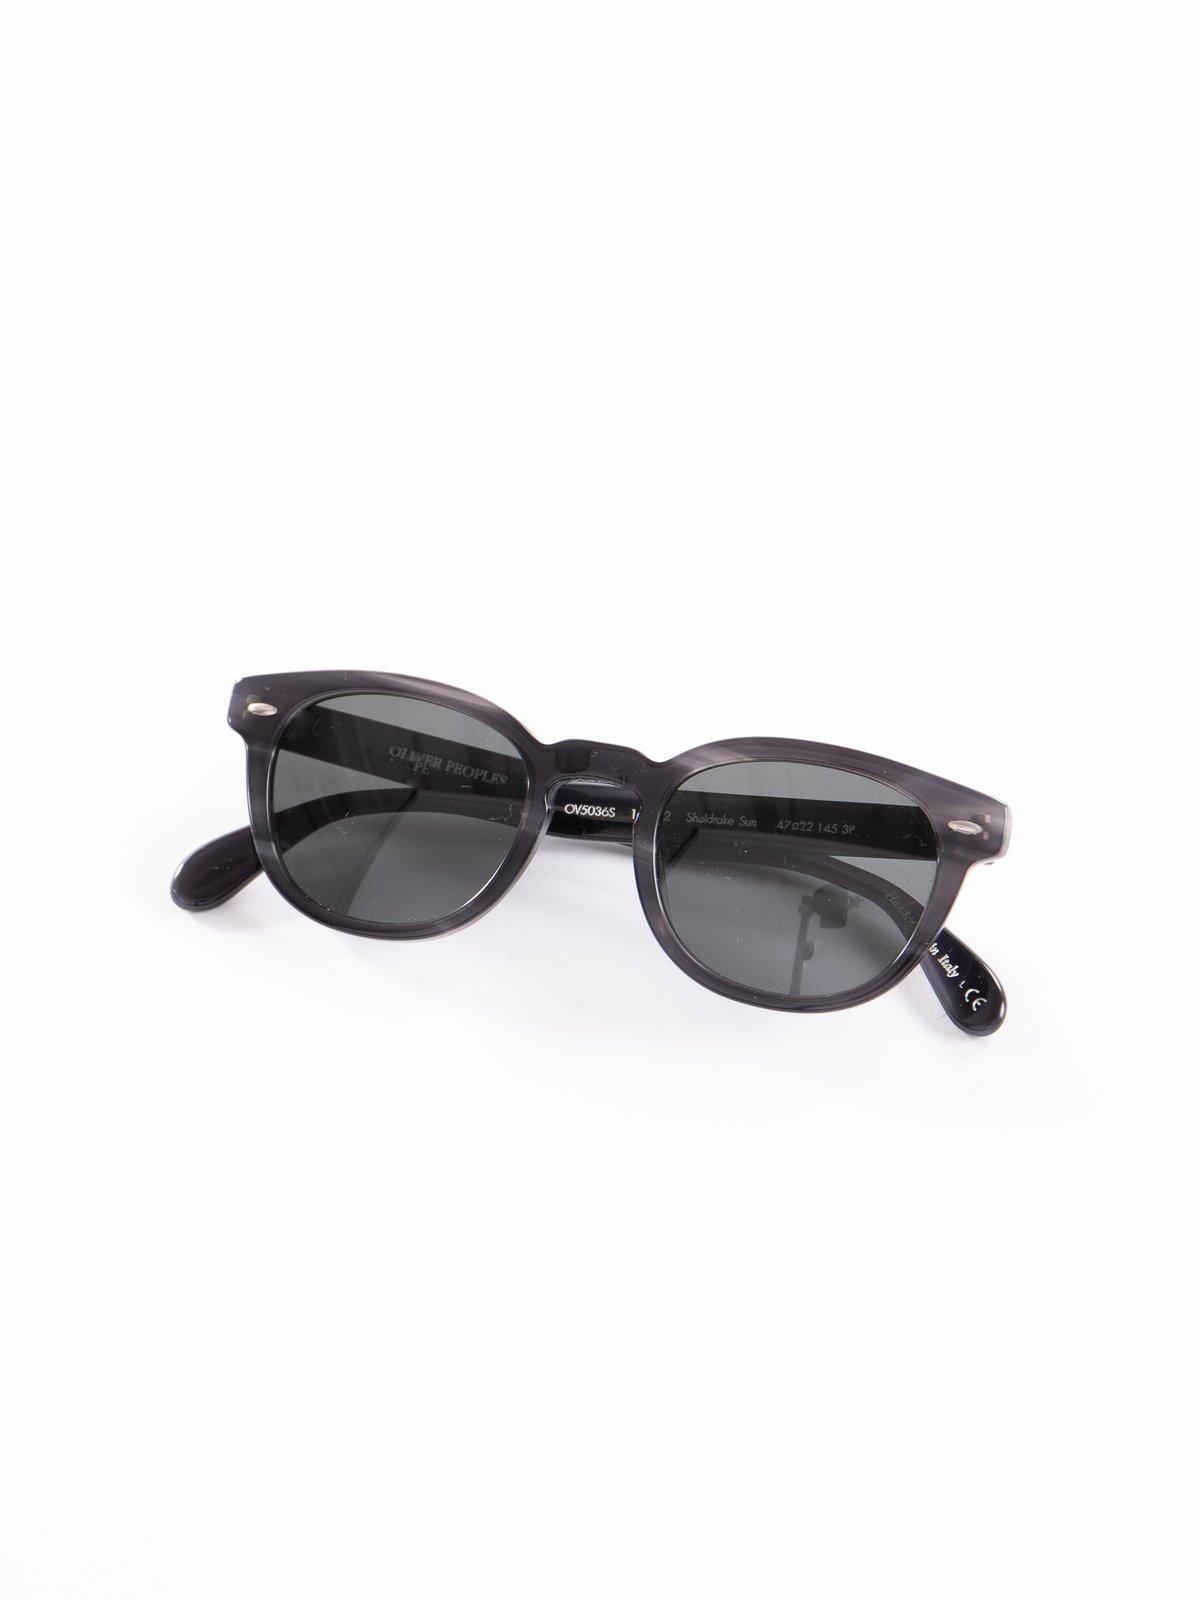 Charcoal Tortoise/Midnight Express Polar Sheldrake Sunglasses - Image 1